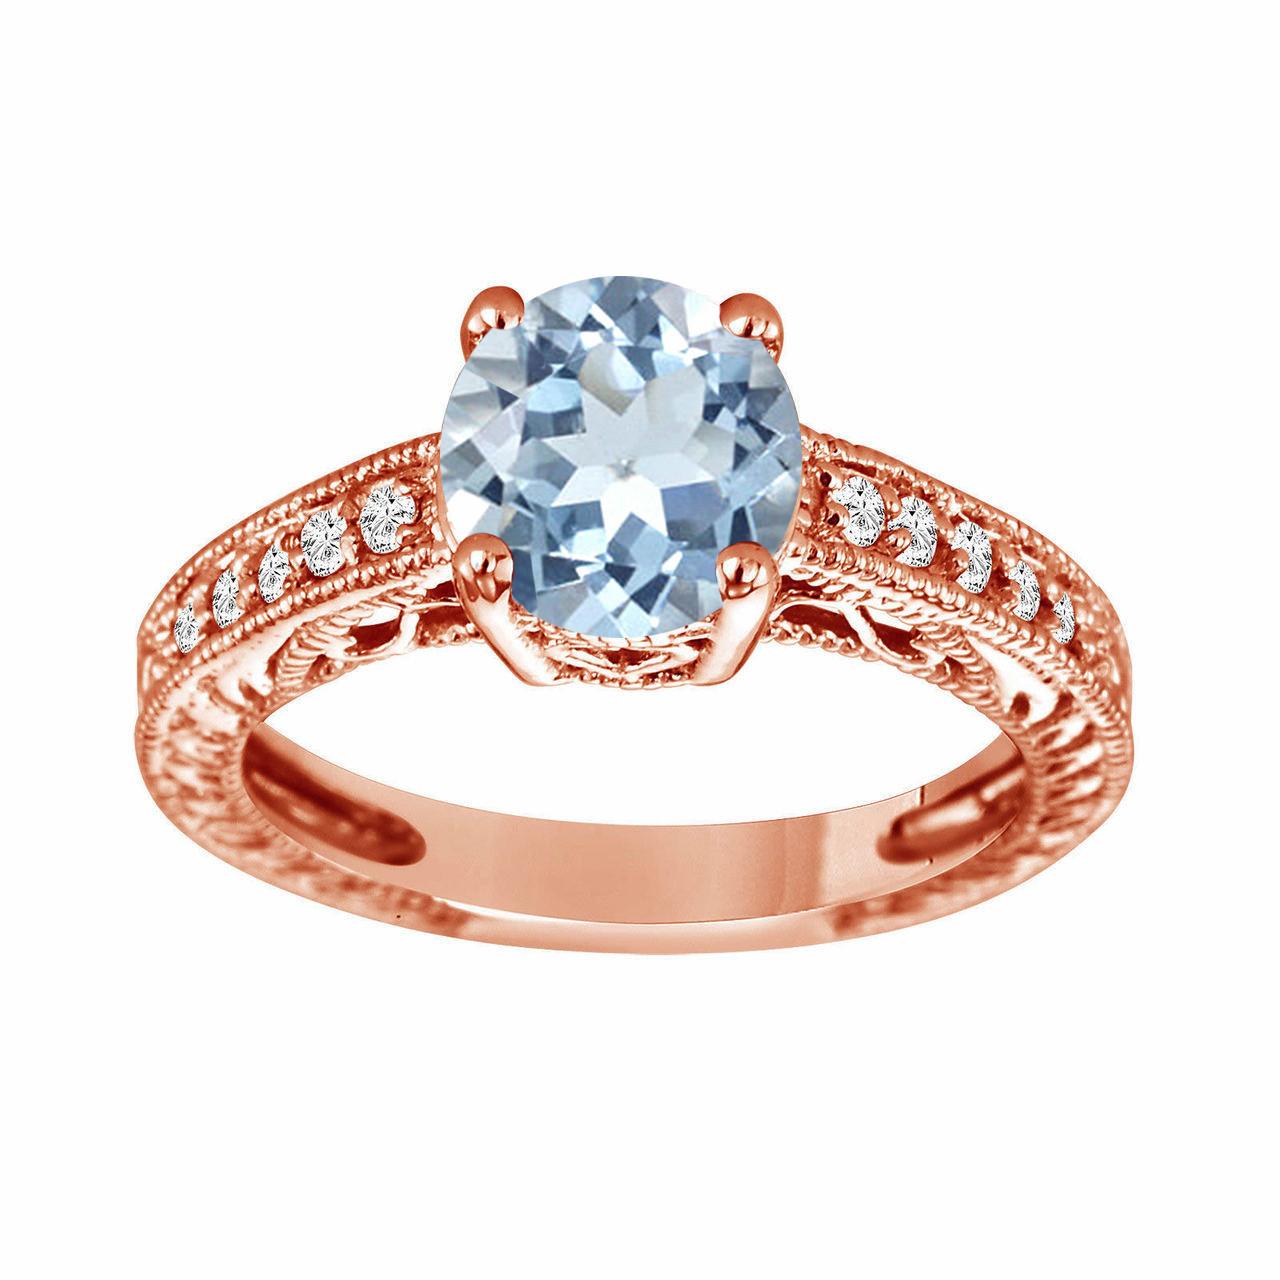 b90b9bbcb Blue Aquamarine Engagement Ring, With Diamonds Wedding Ring ...